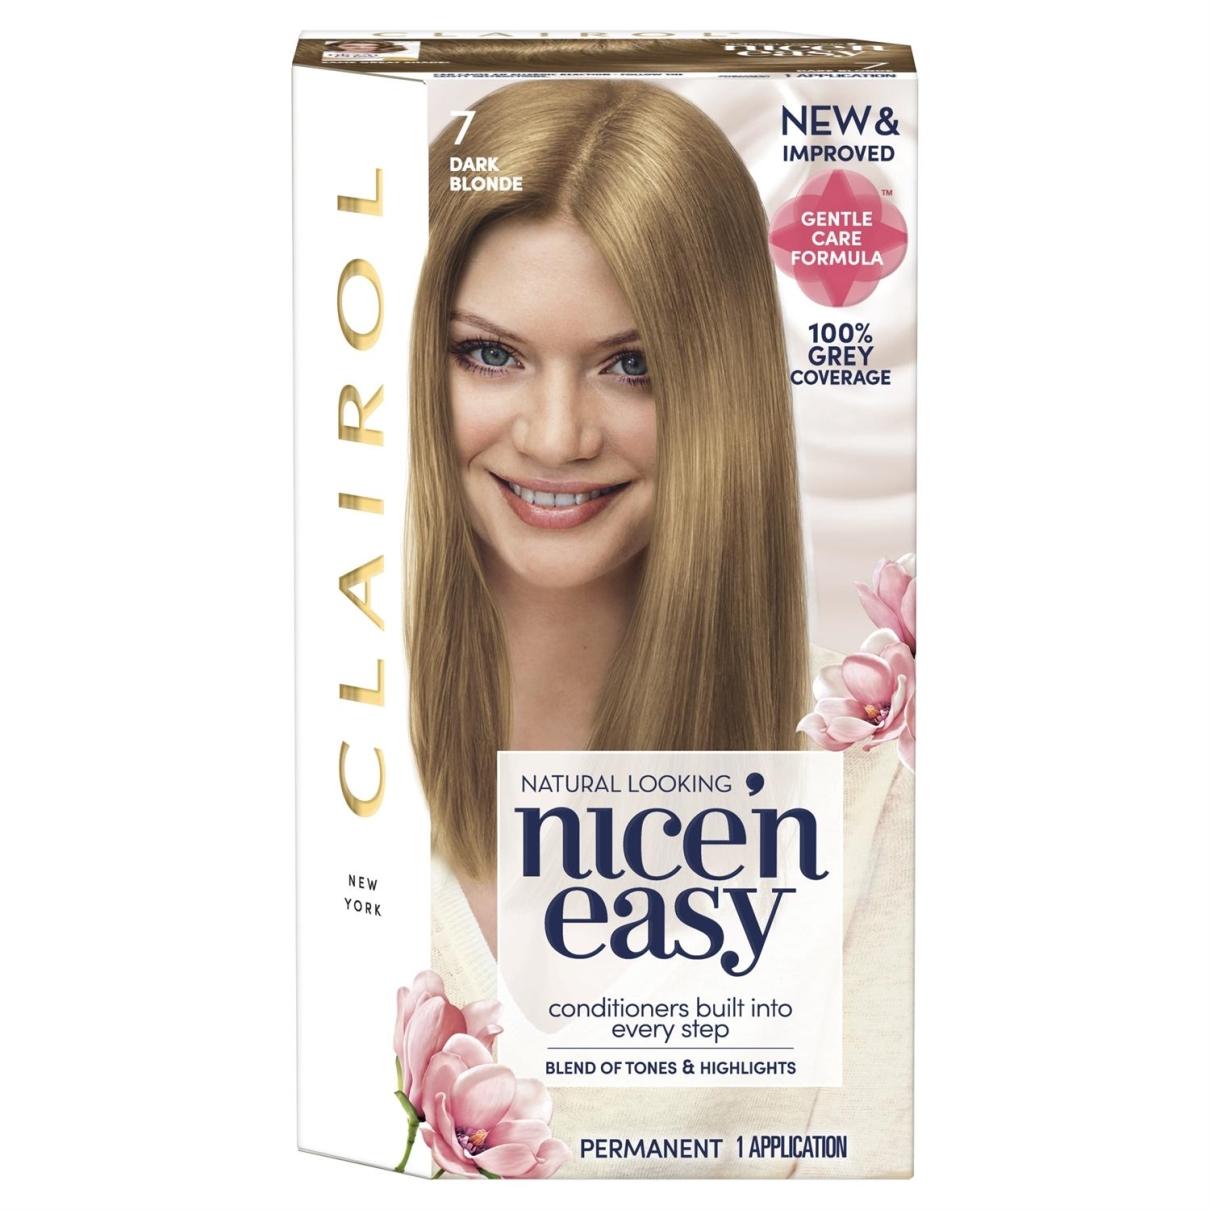 Nice n easy blonde hair colours clairol colour experts nvjuhfo Choice Image